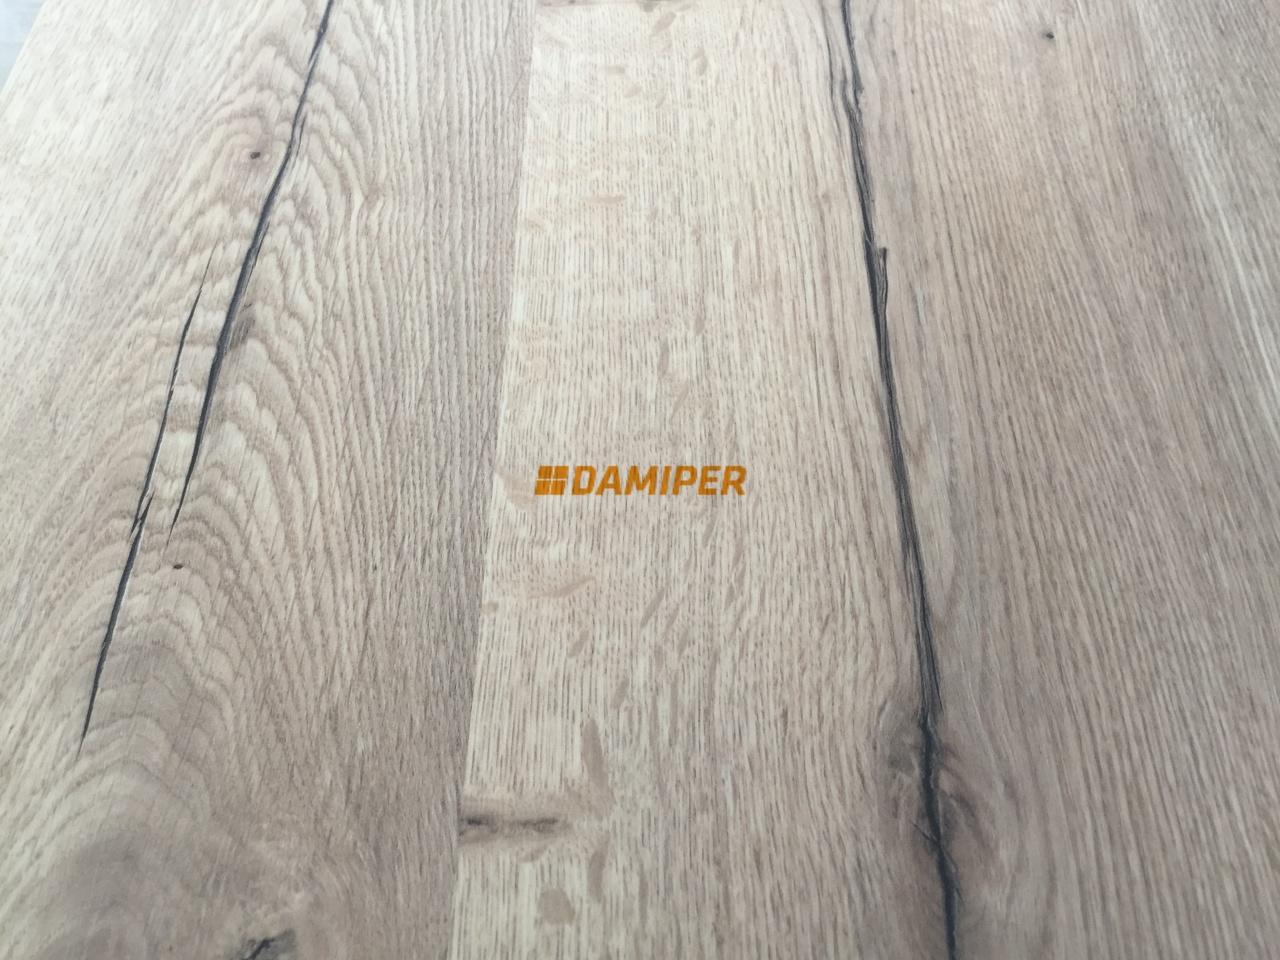 kompozitne_podlahy_egger_greentec_ehd014_dub_monfort_prirodny_damiper